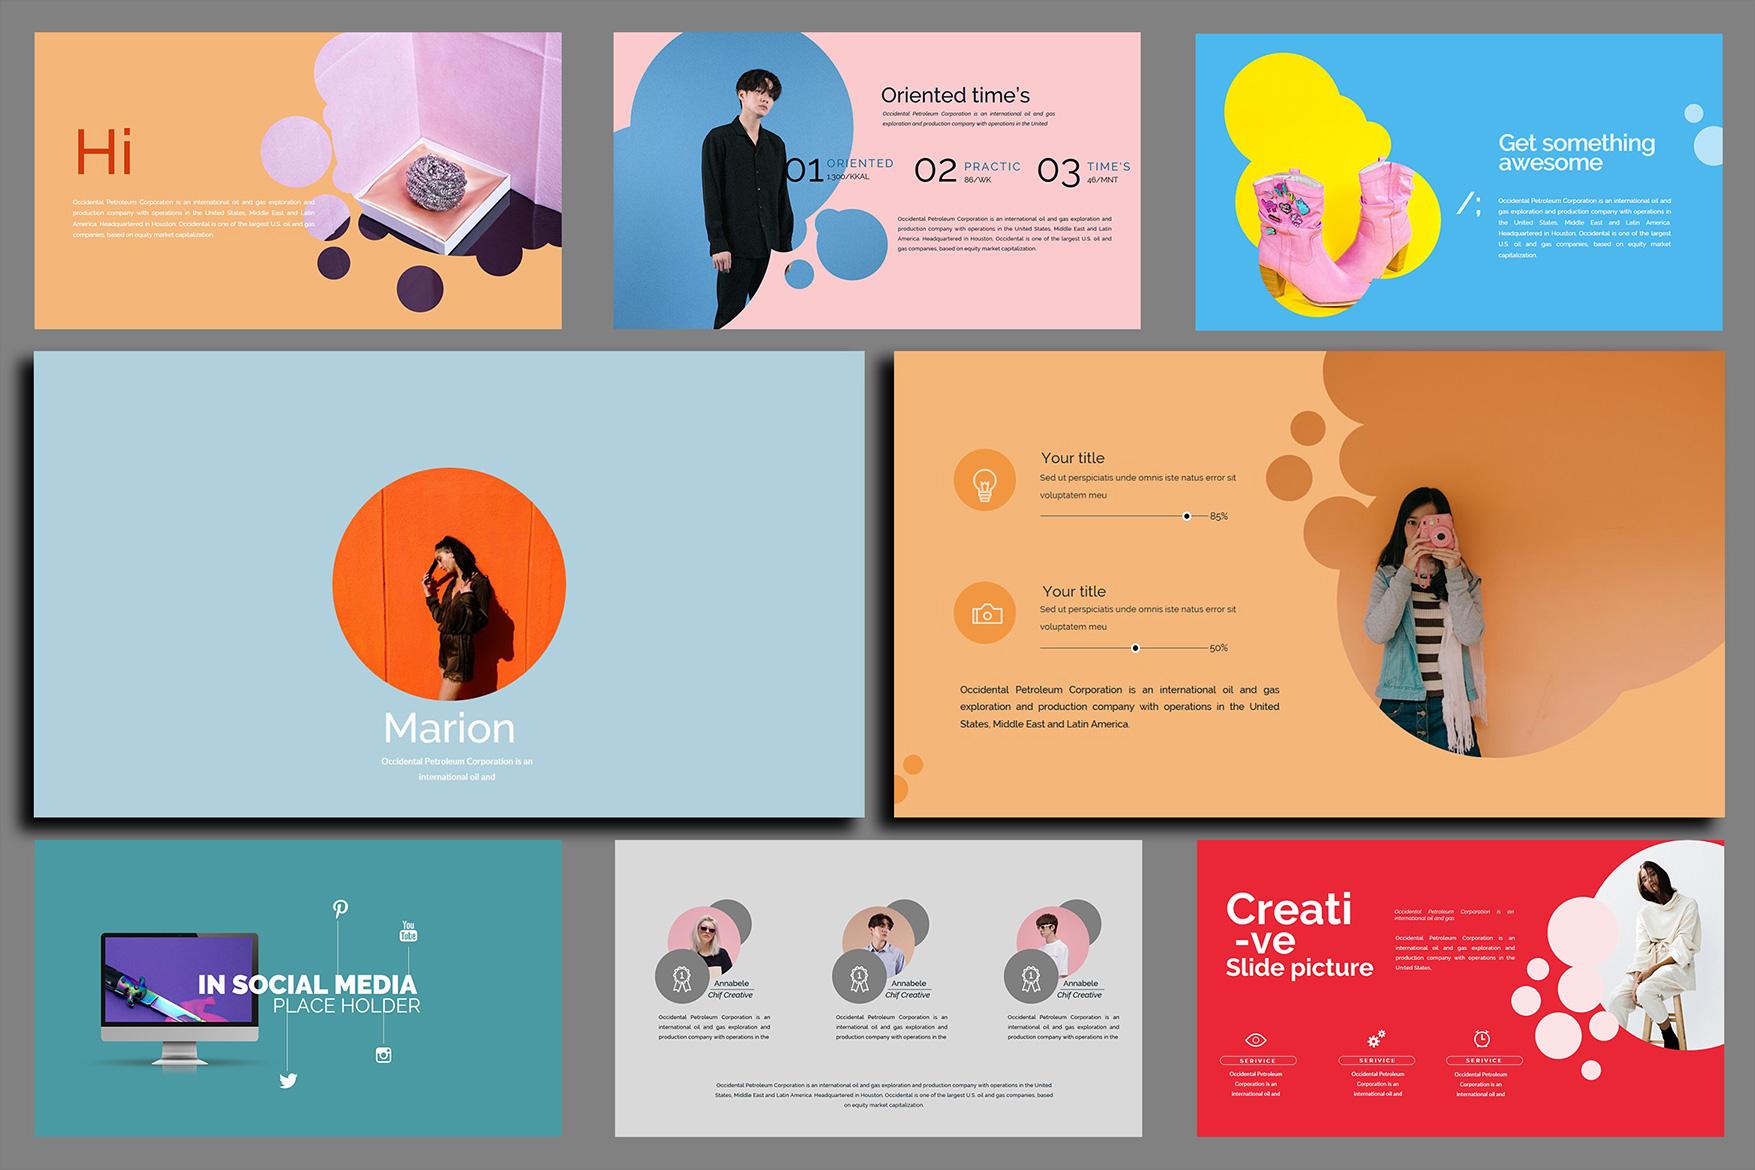 Velvety Fashion Google Slides Presentation example image 4